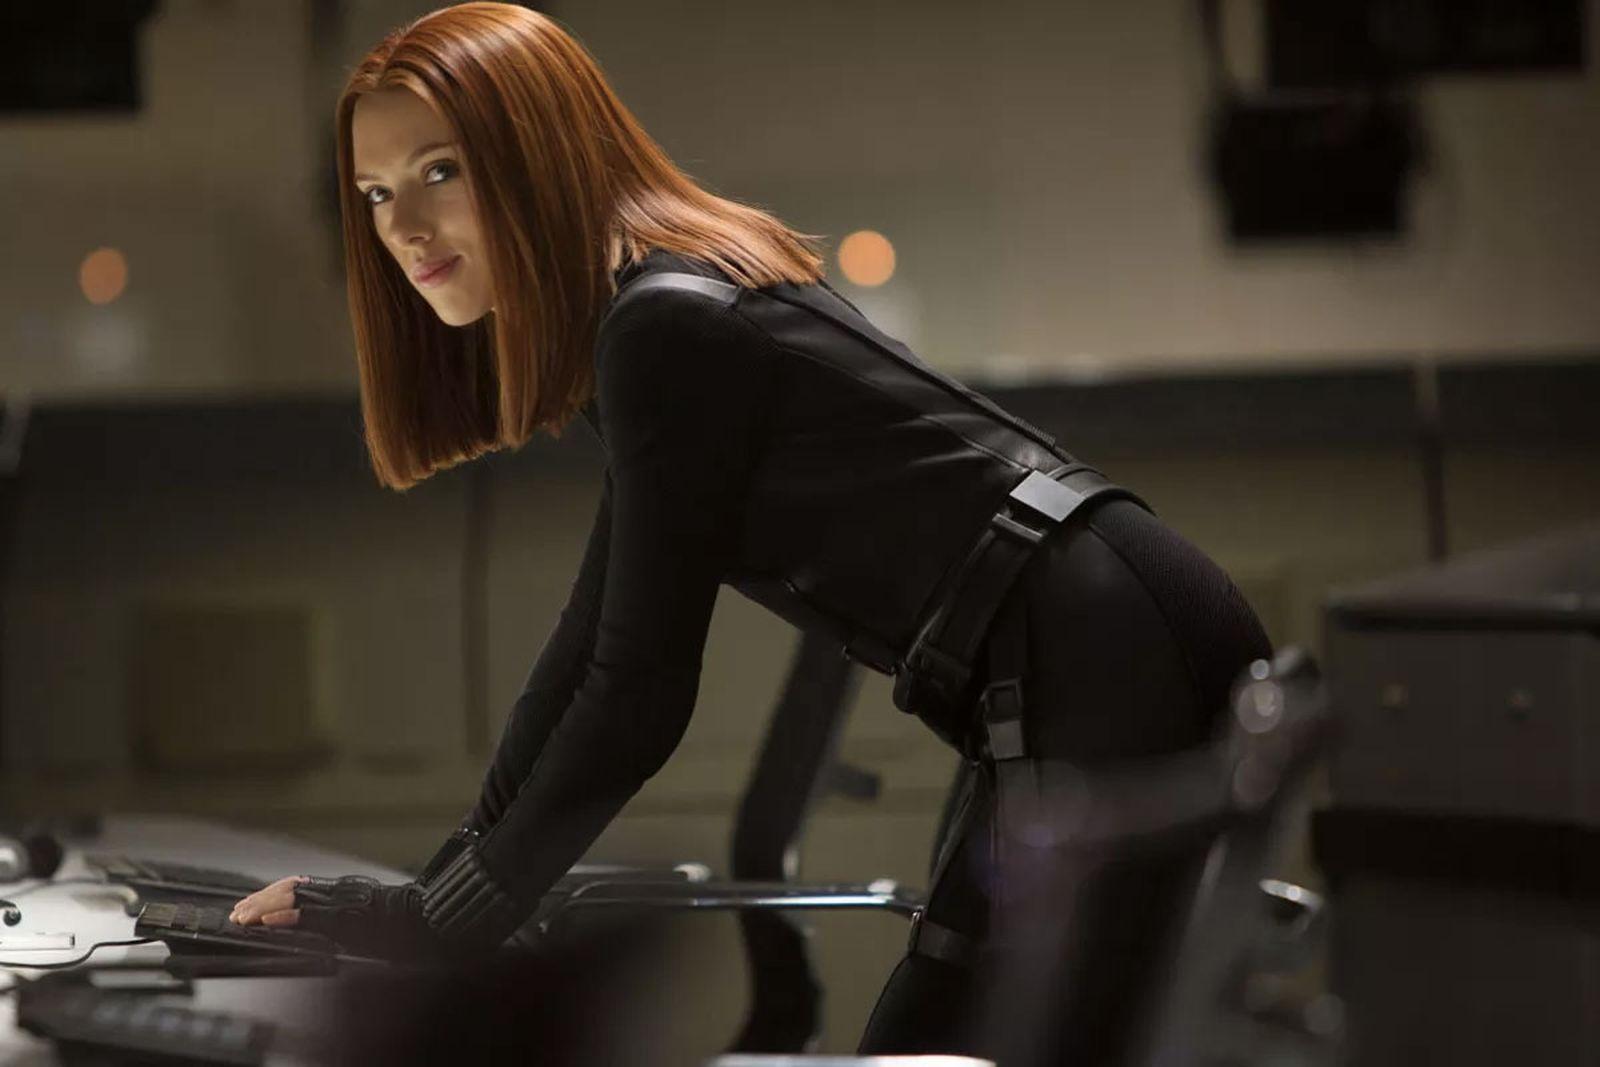 marvel avengers pornhub searches